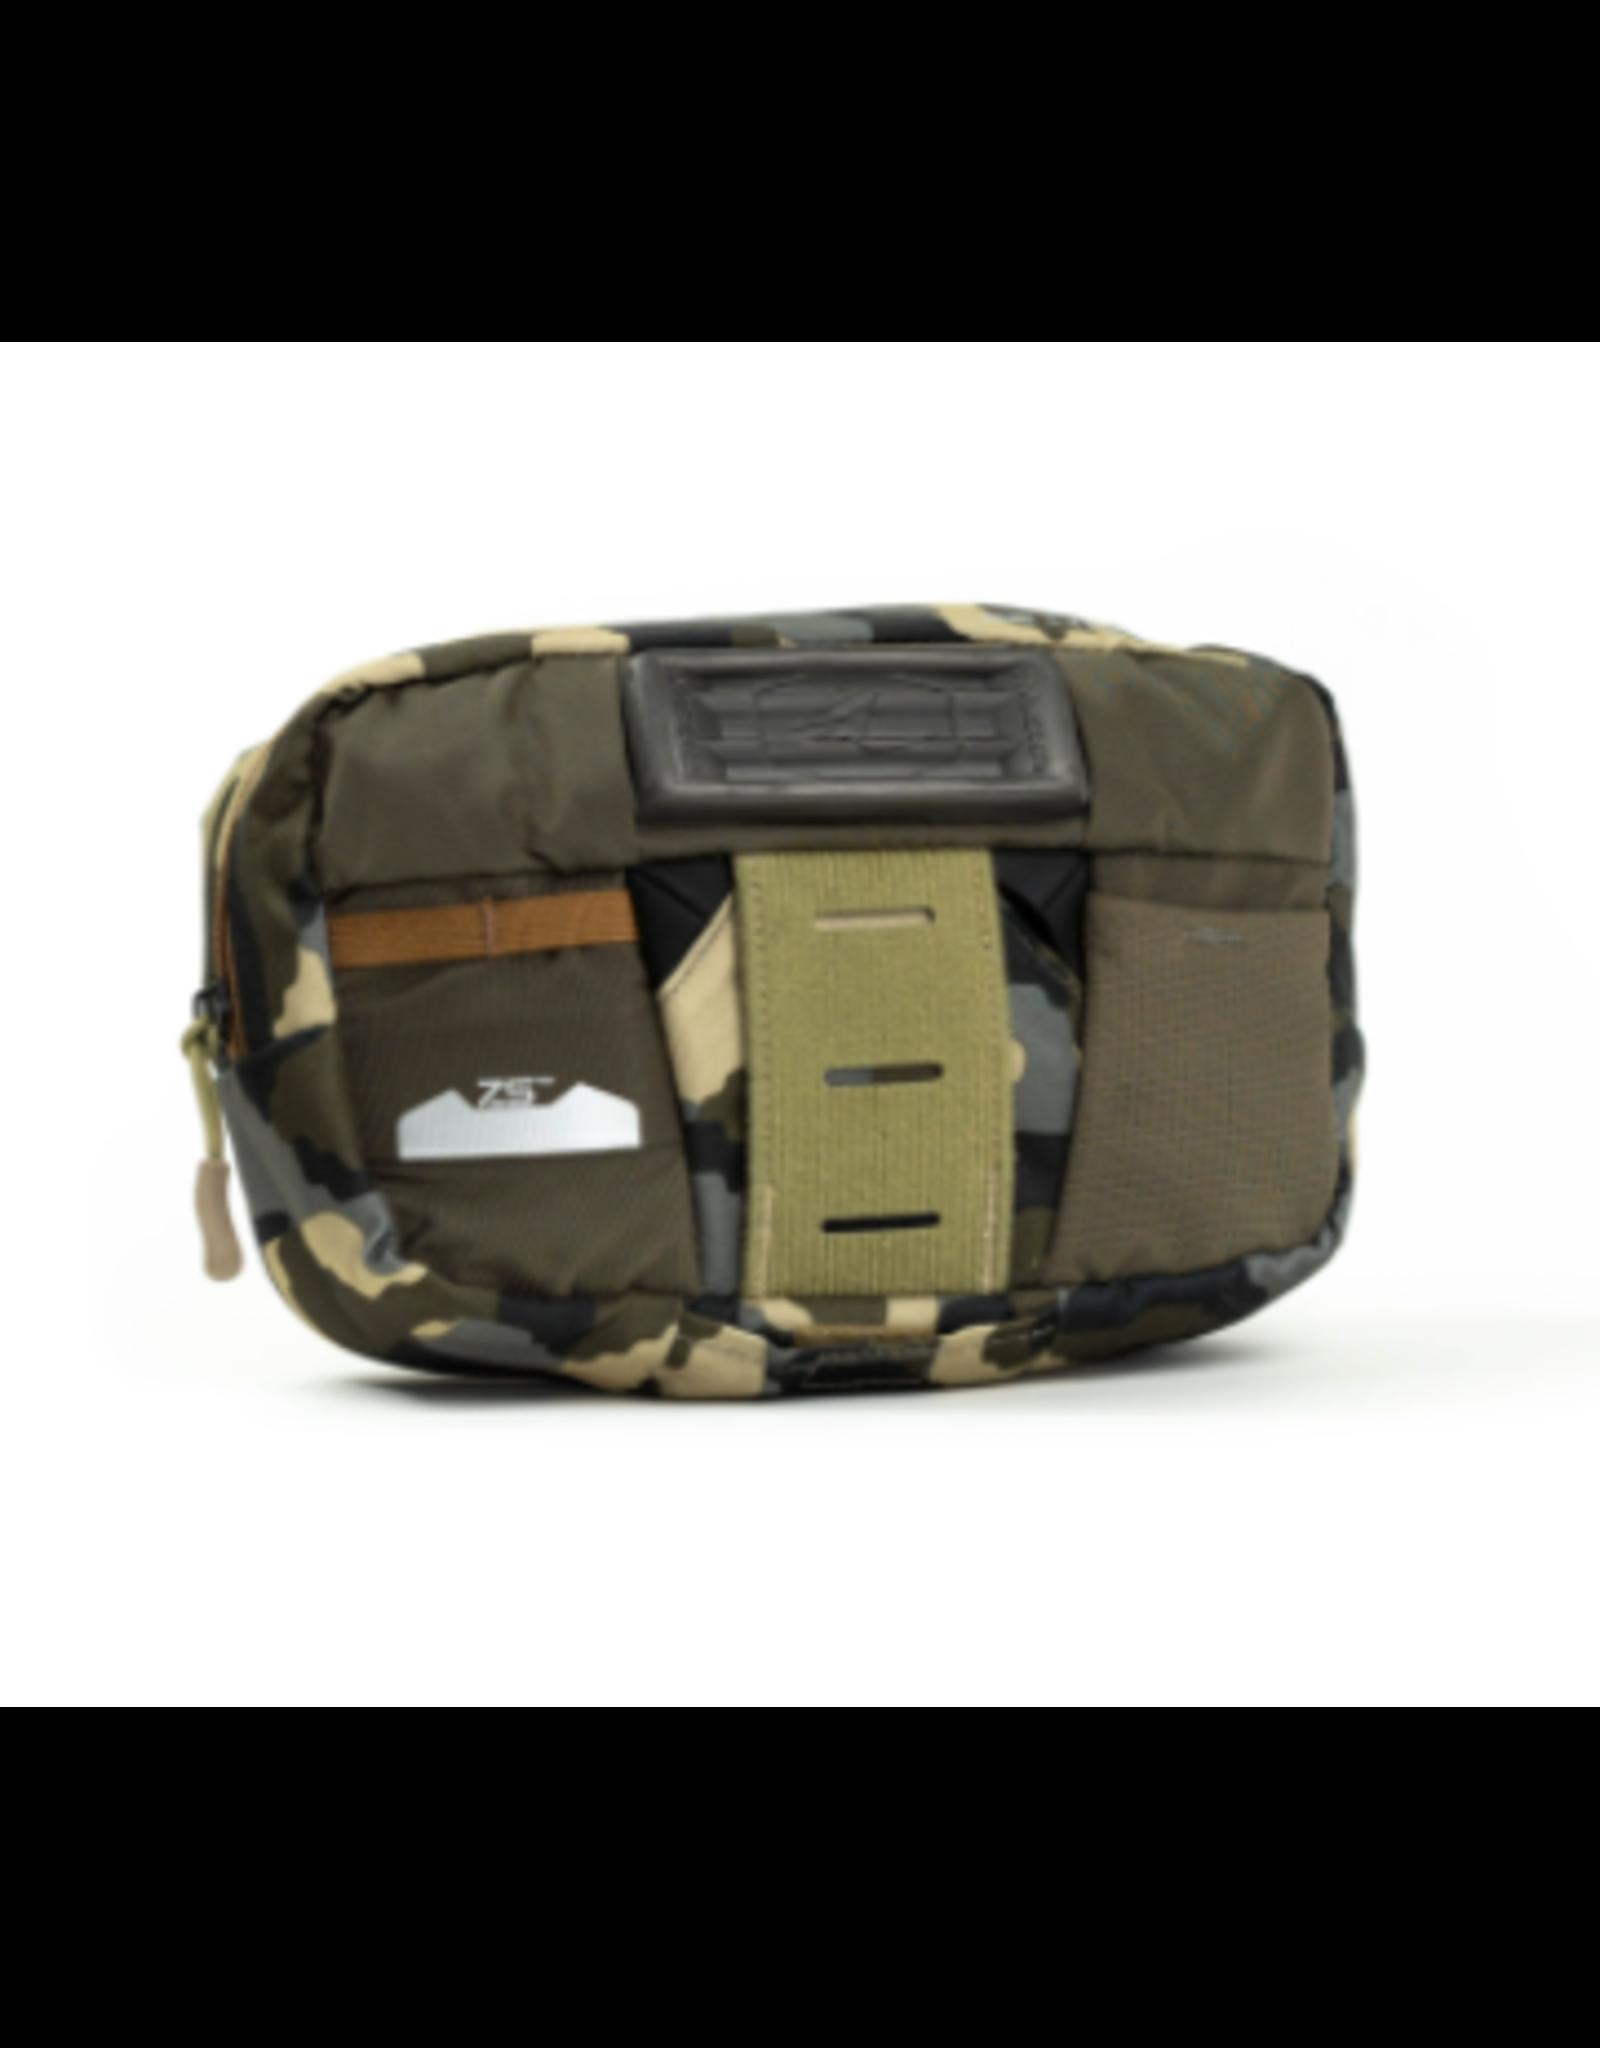 Umpqua Umpqua Wader ZS2 Compact Chest Pack